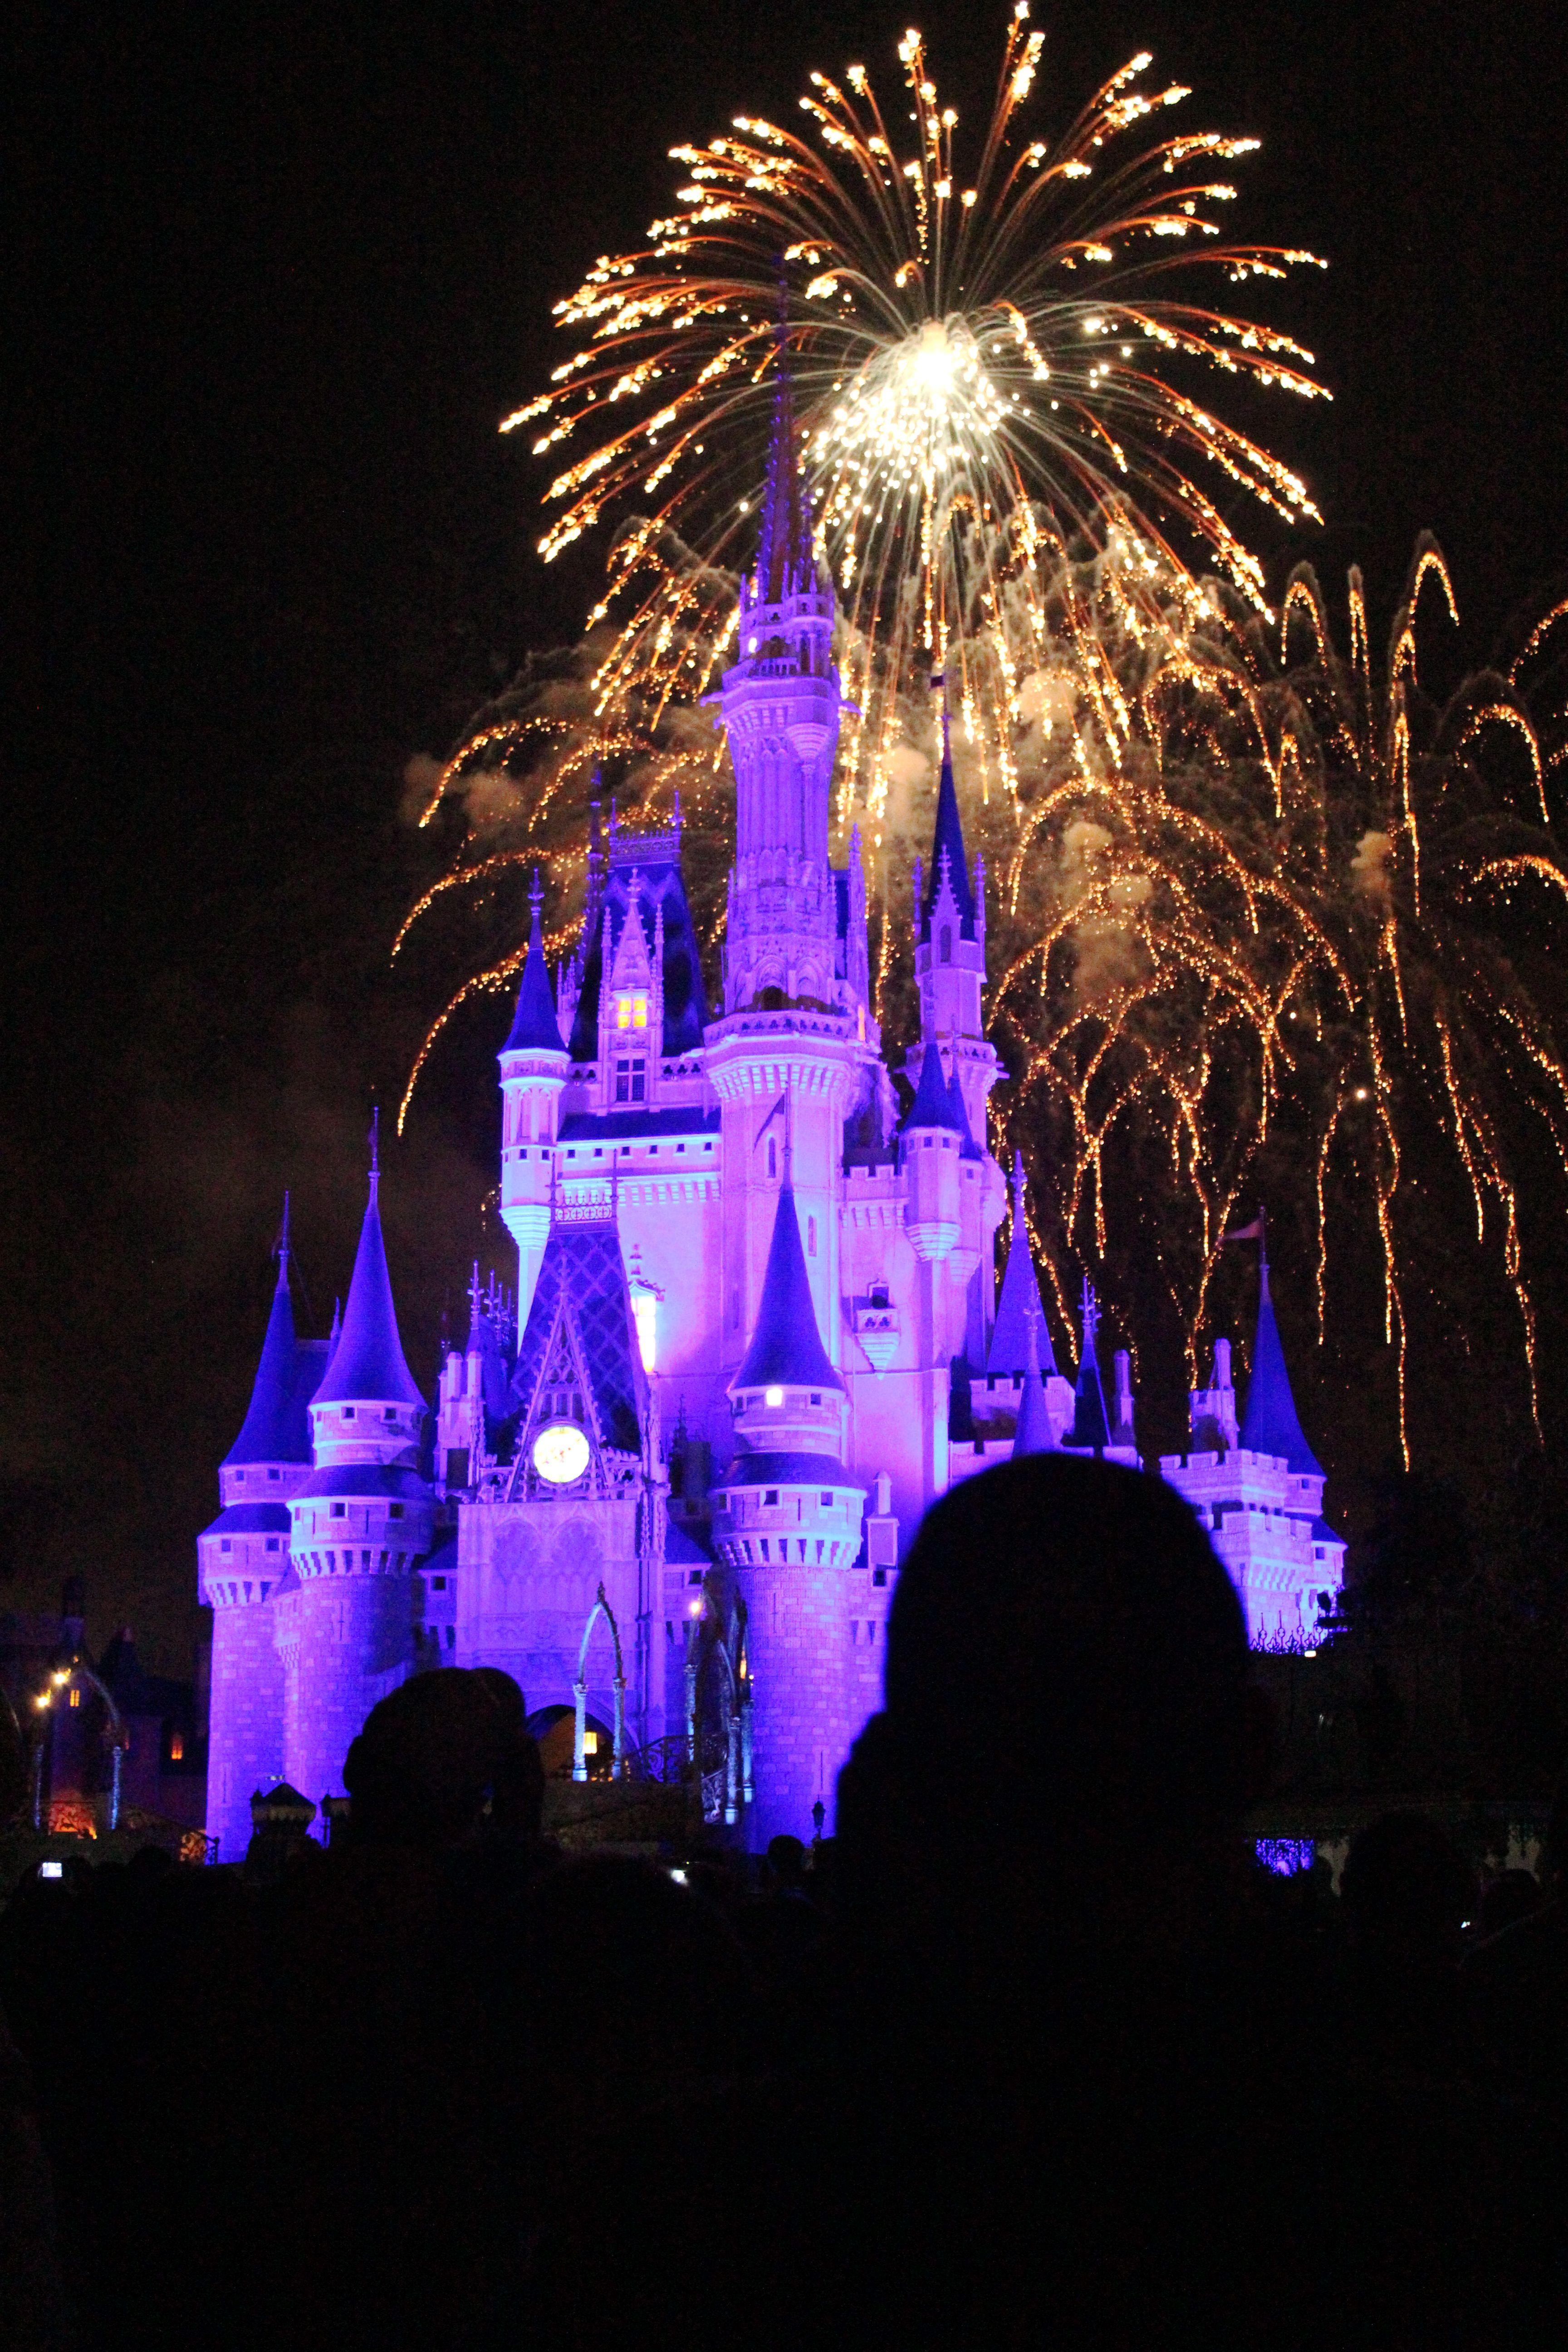 disney magic Vacation spots, Disney magic, Favorite places